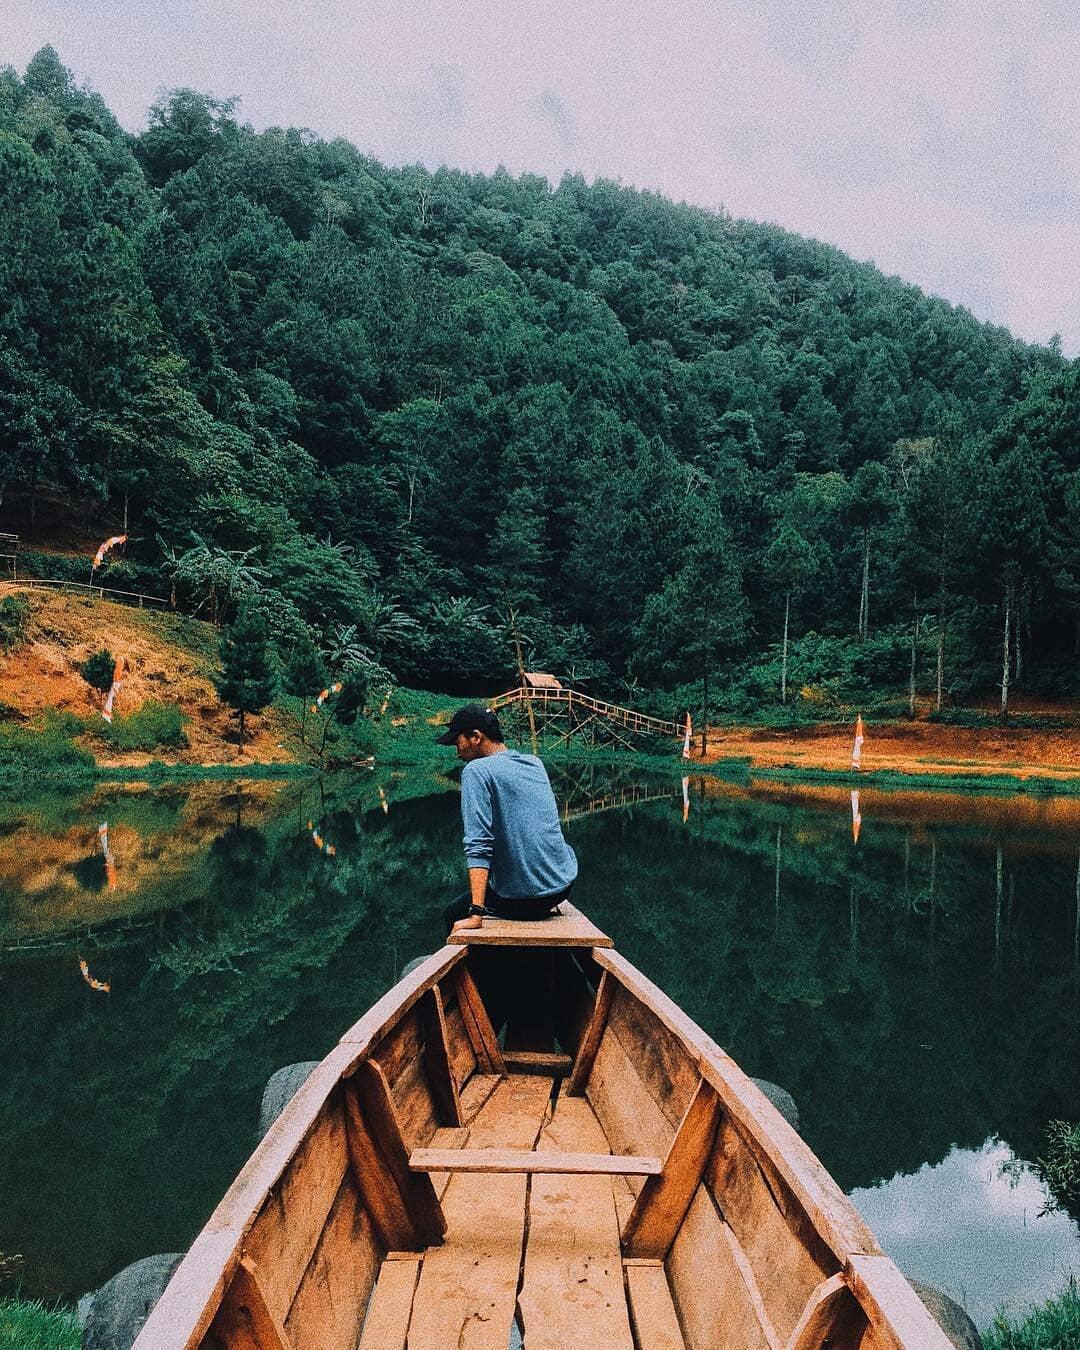 9 Destinasi Wisata Di Cirebon Dan Sekitarnya Yang Asyik ...